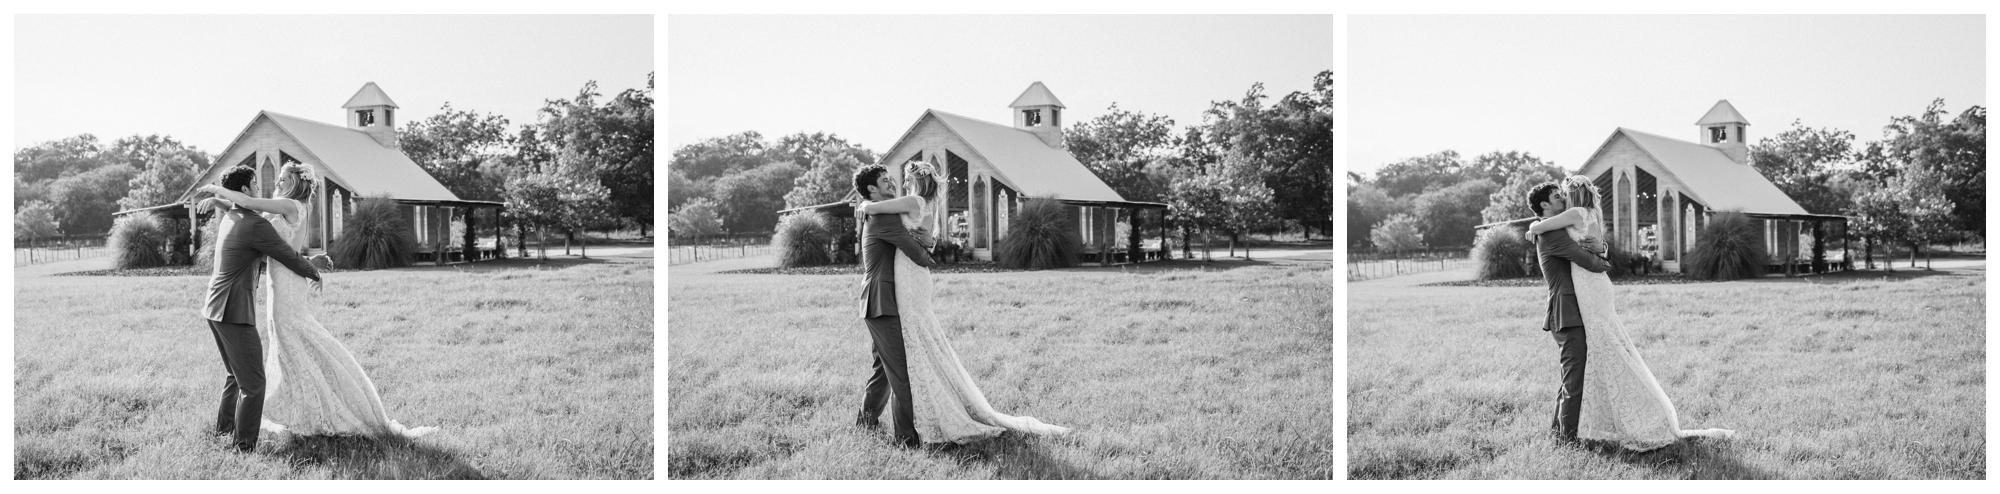 austin-texas-wedding-photography-1778-photographie_0117.jpg